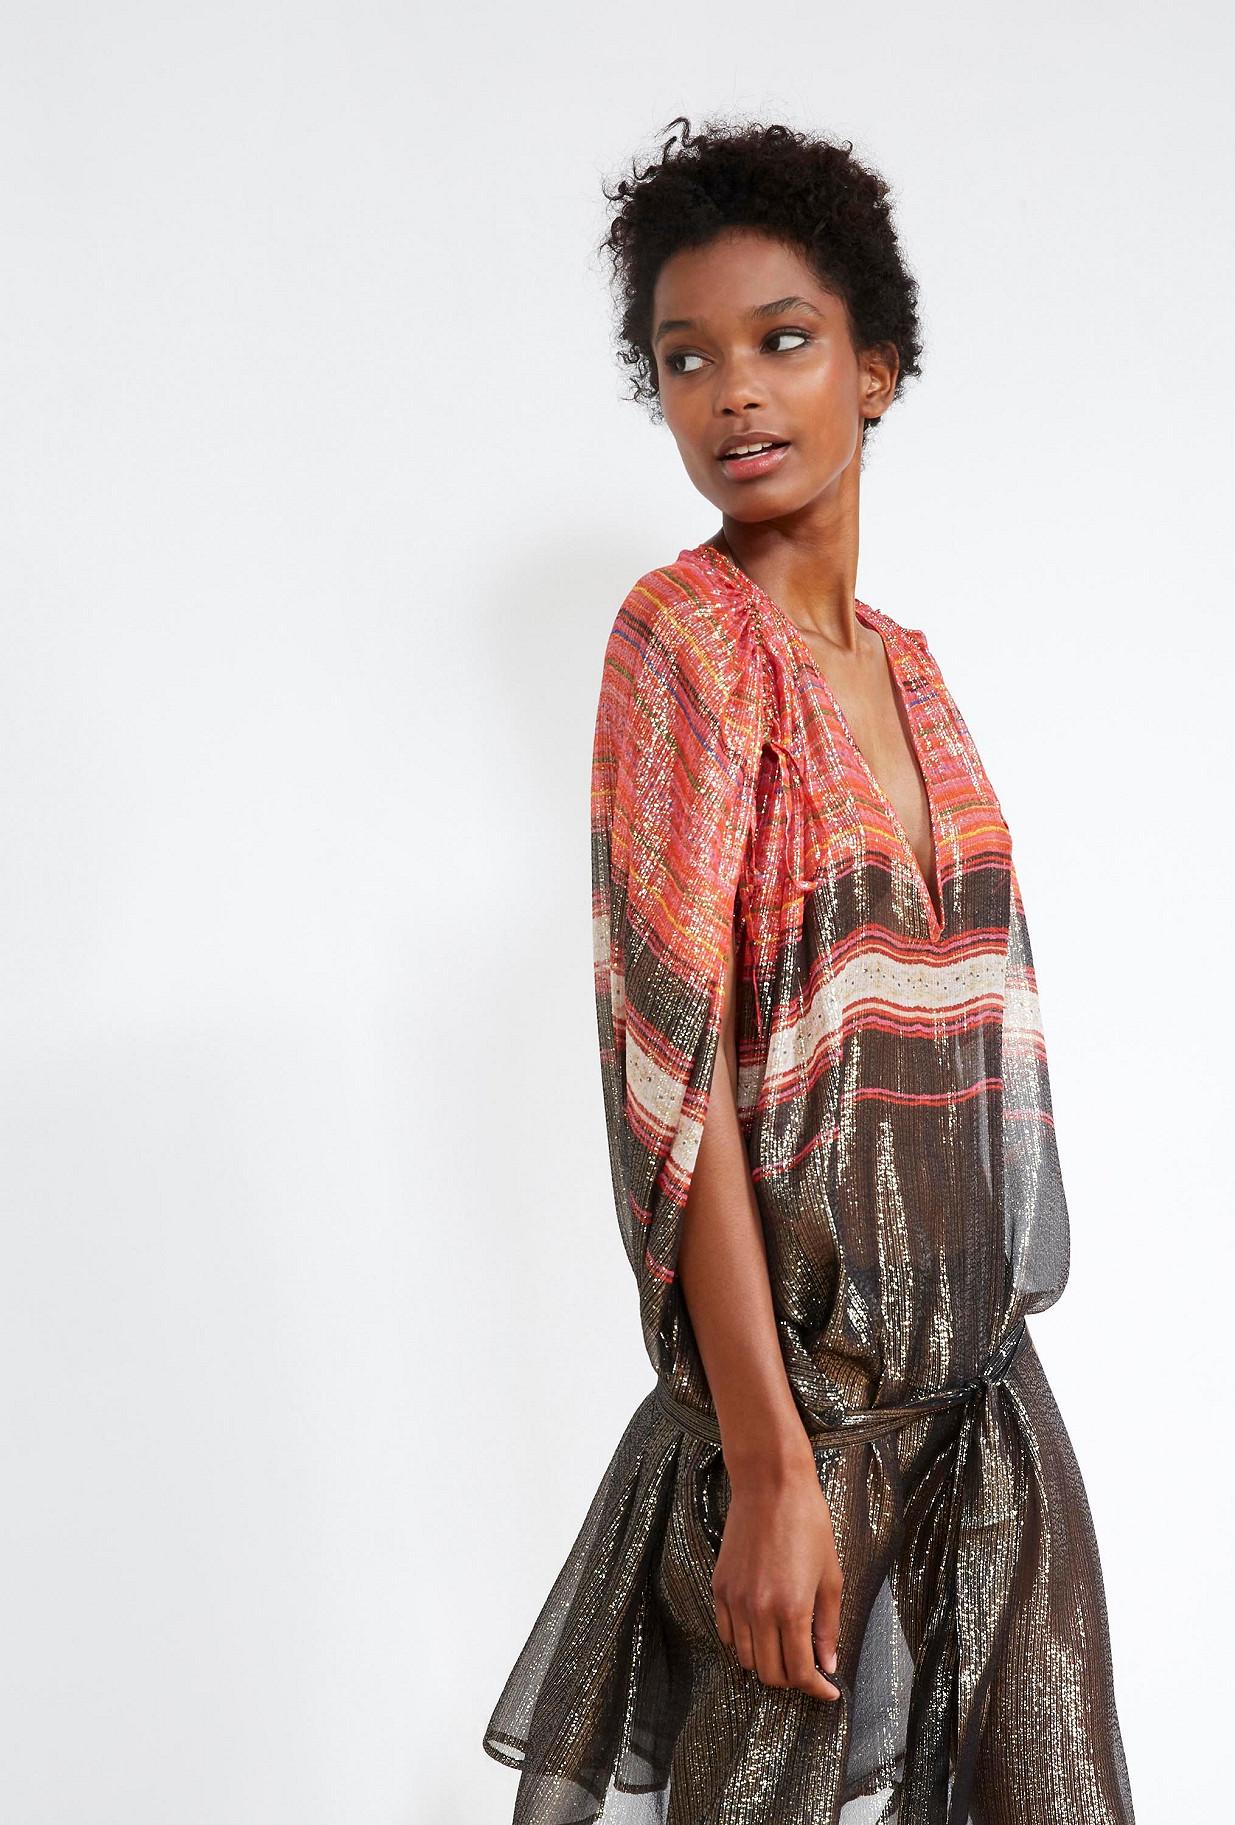 clothes store PONCHO  Daravan french designer fashion Paris